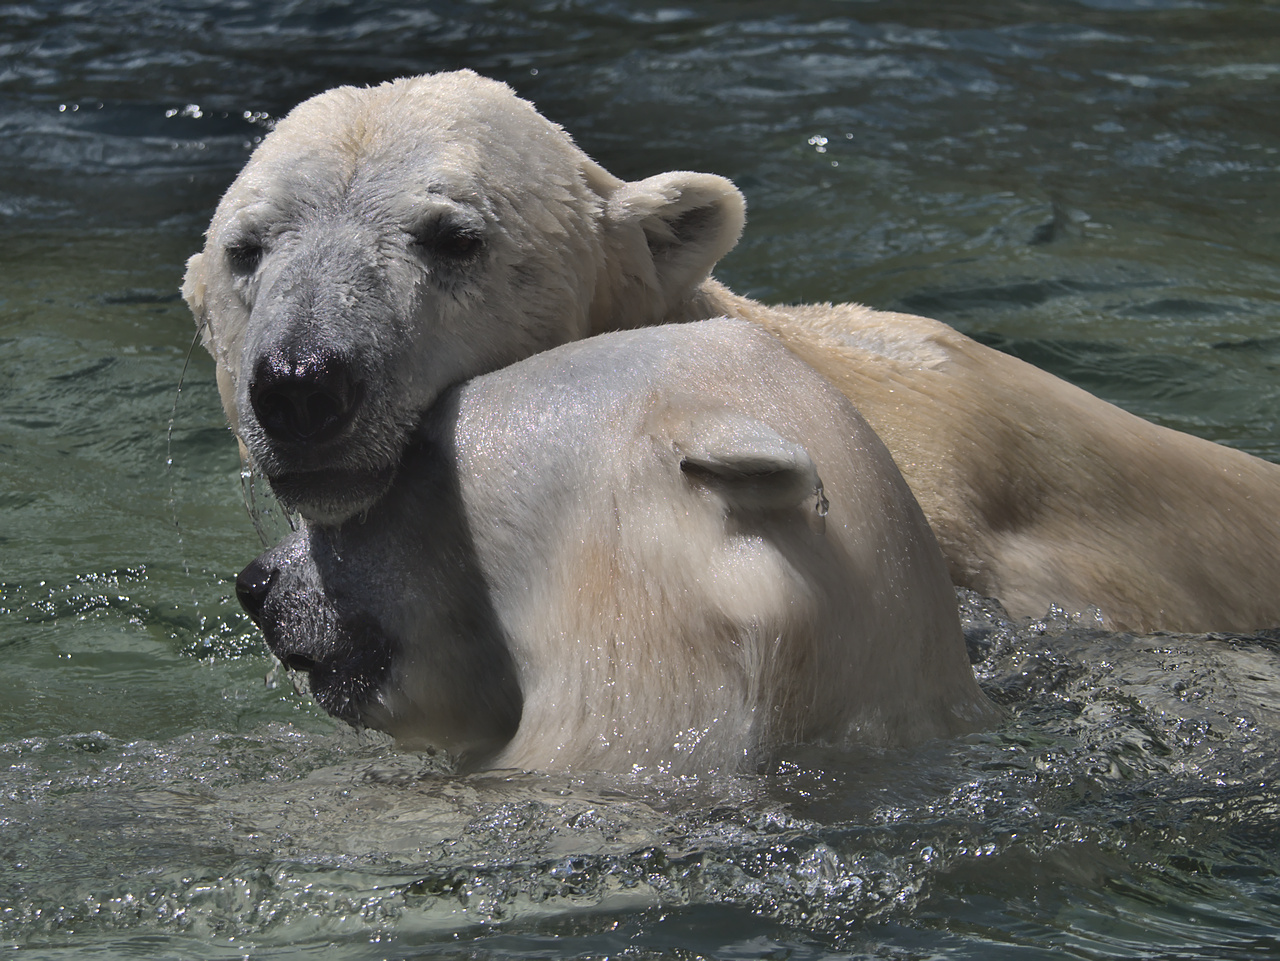 20200601_Zoo_Karlsruhe_018